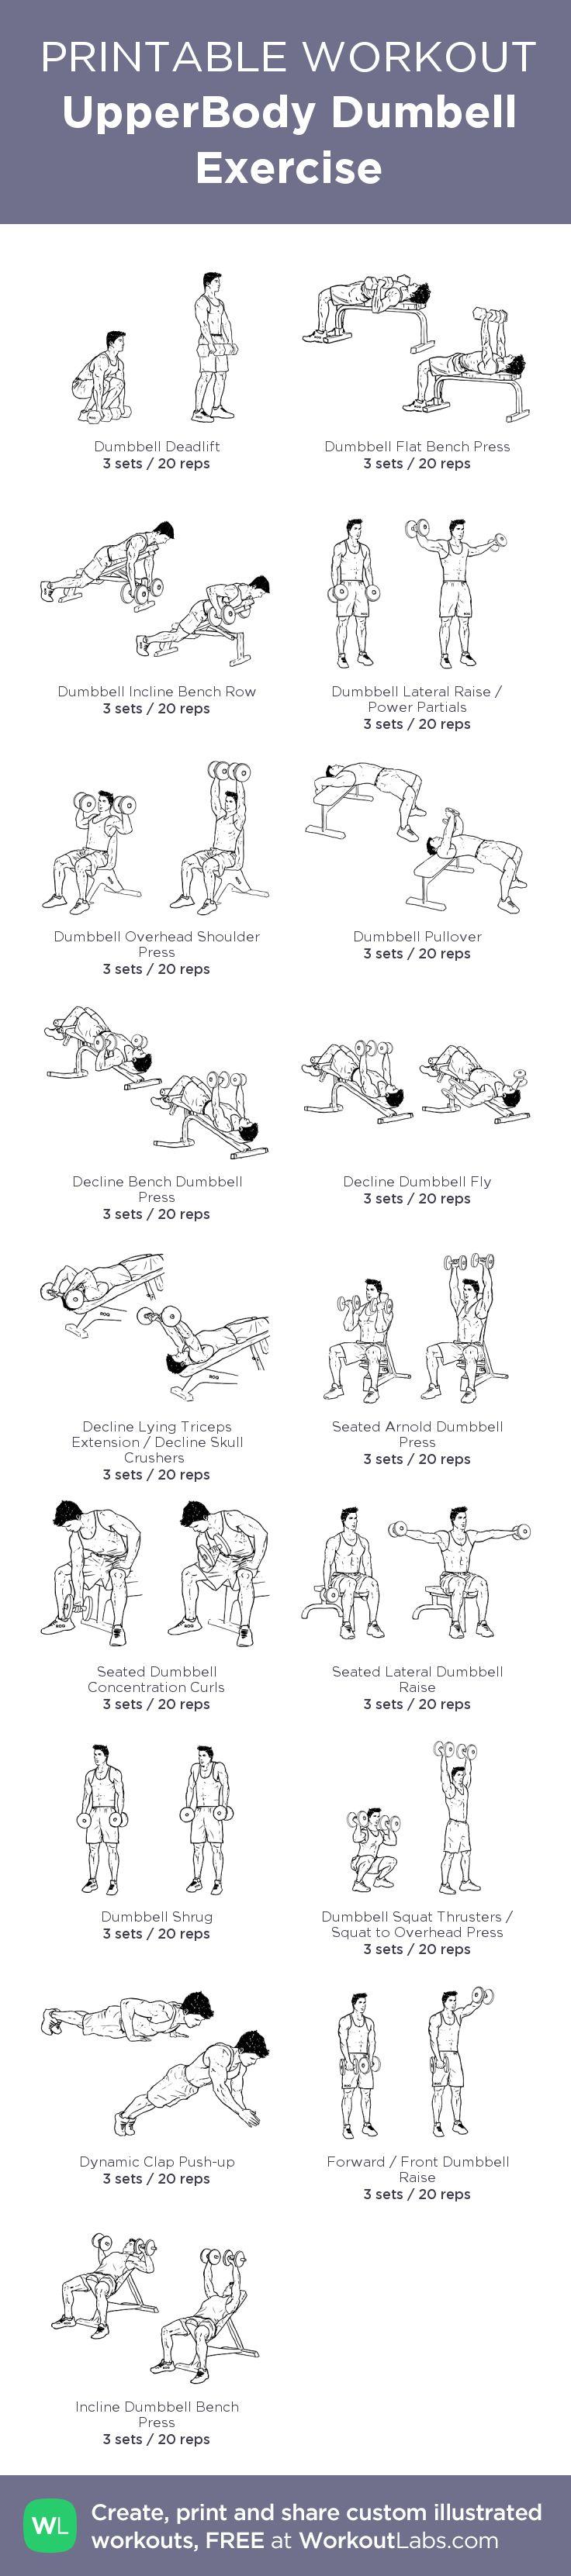 best dumbbell workout weight loss